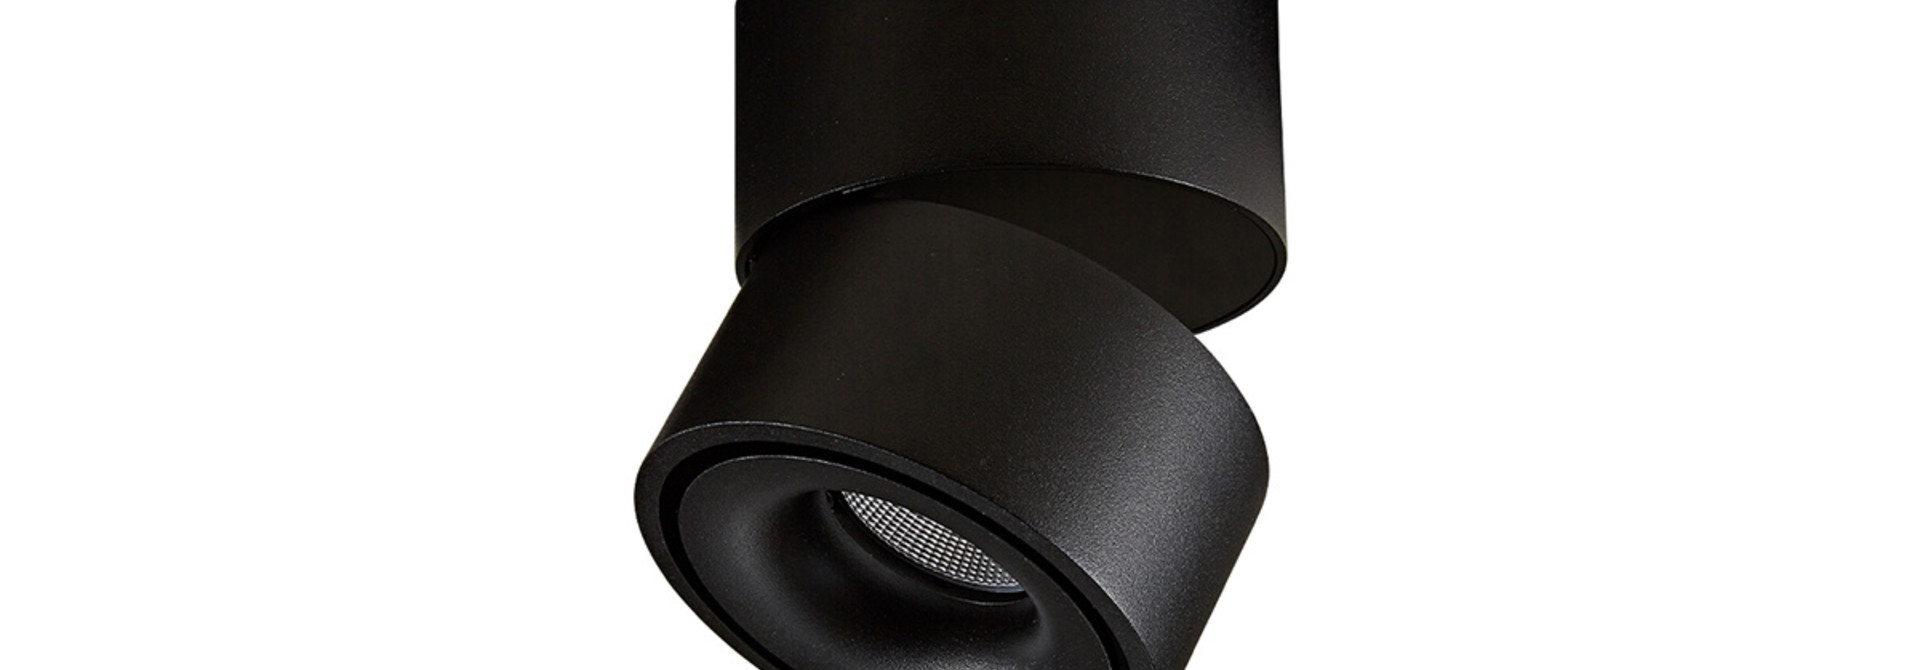 Look Mini 9.2W LED 34dgr 2700K 845lm CRI>90 Dimm Black